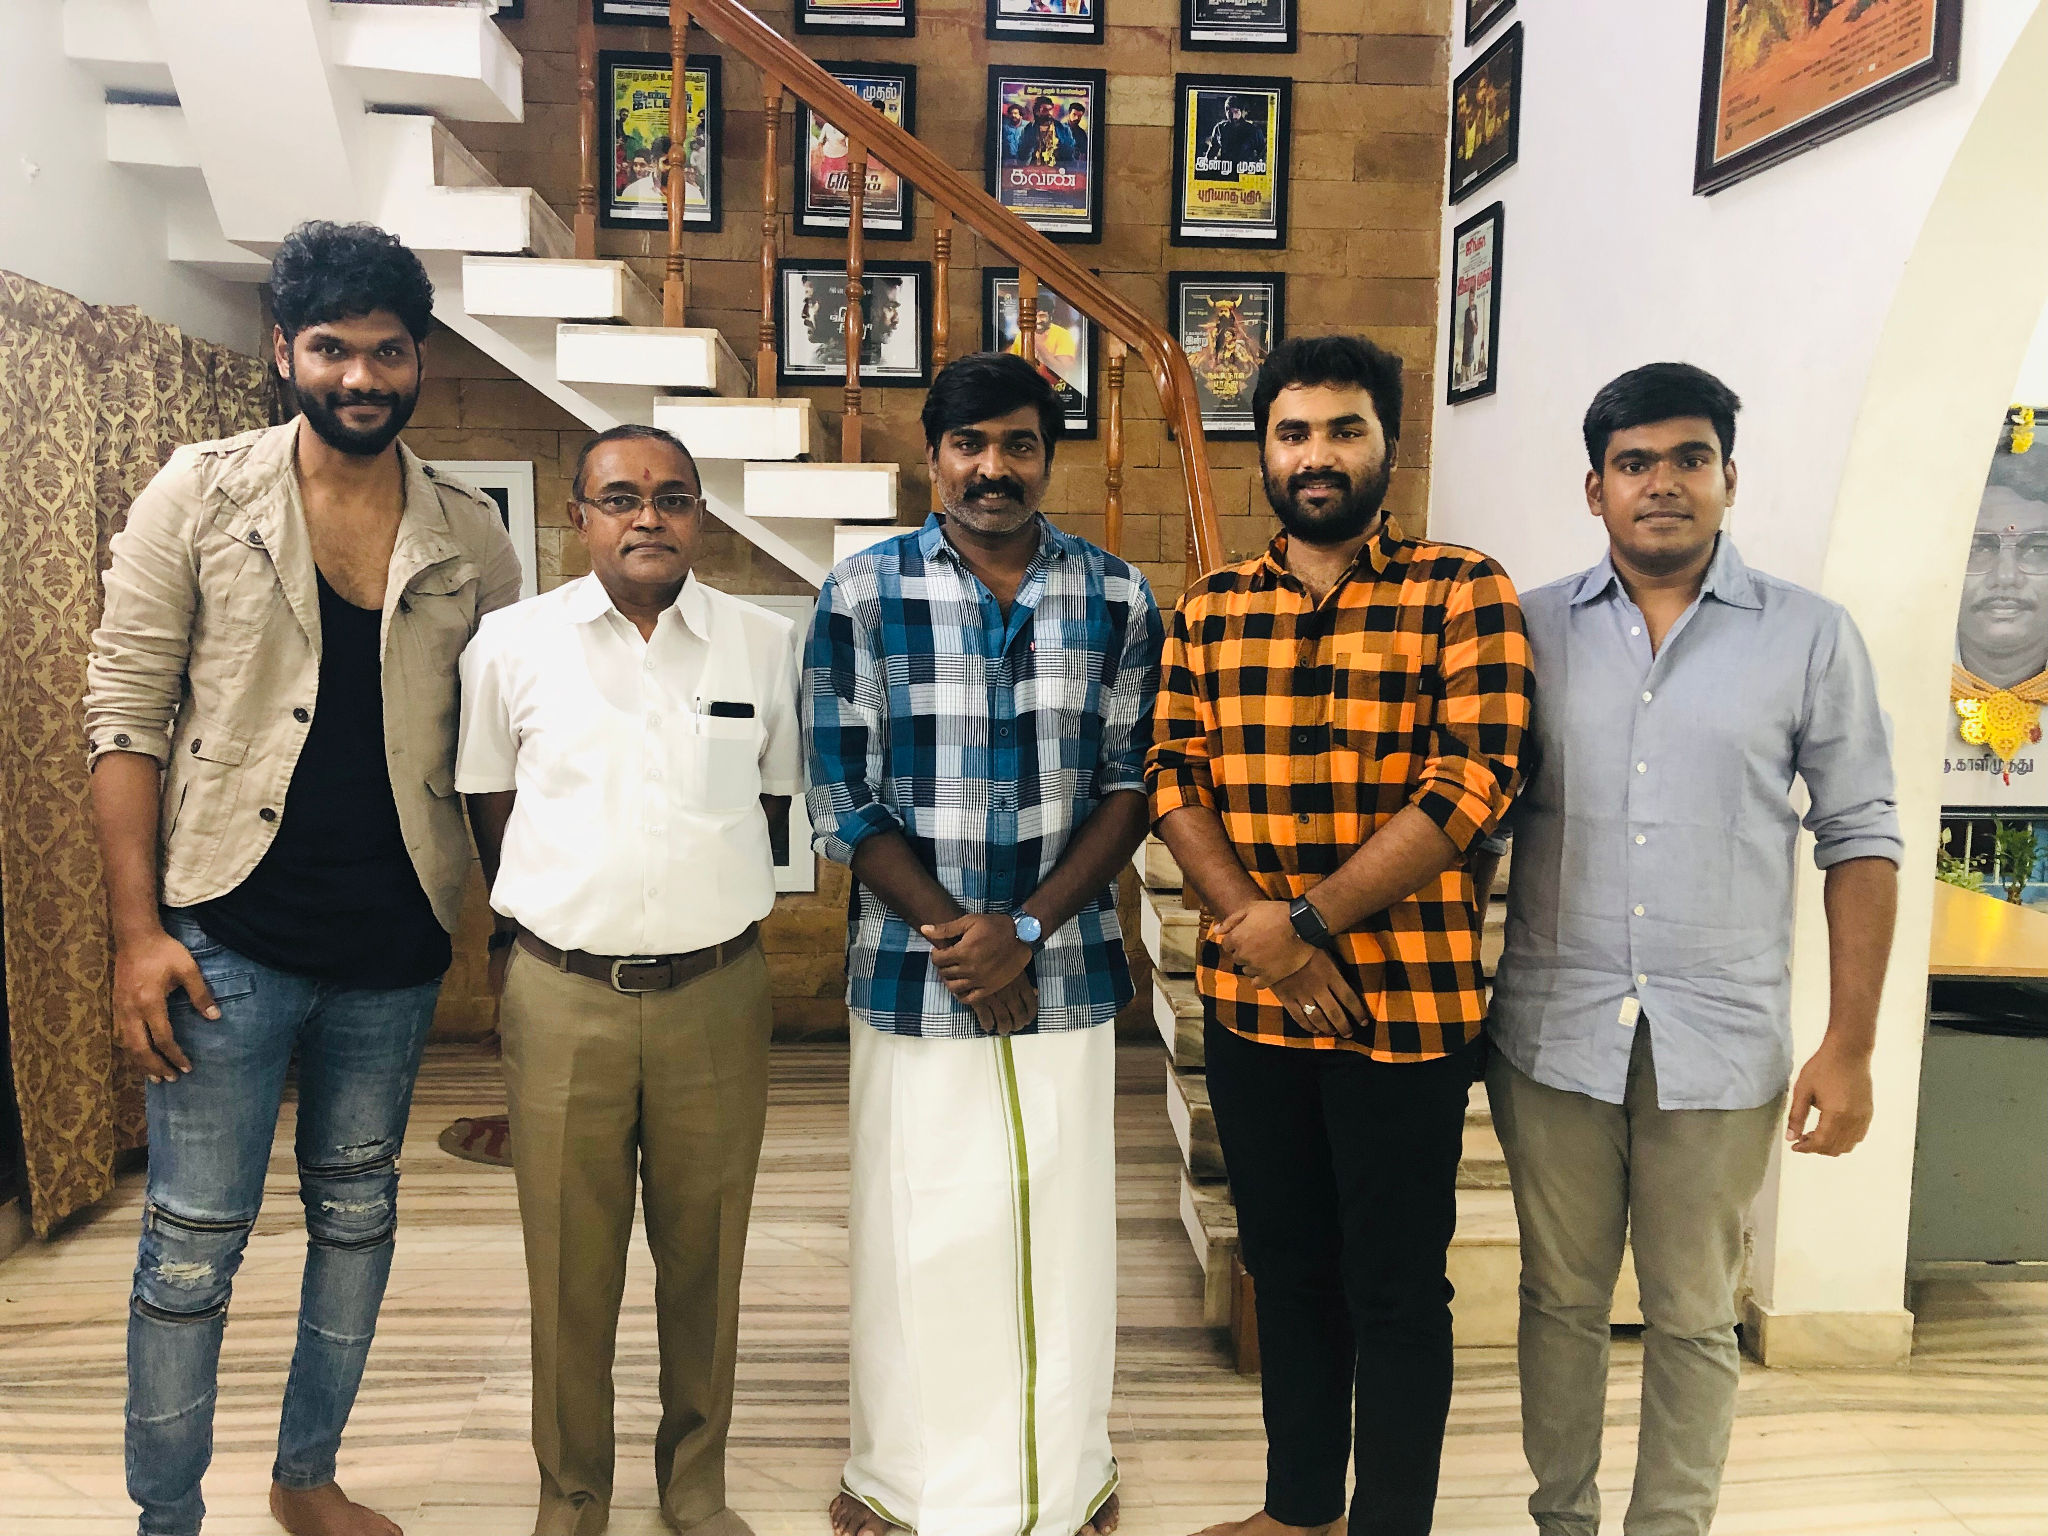 Vijay Sethupathi New Movie with Venkata Krishna Roghanth